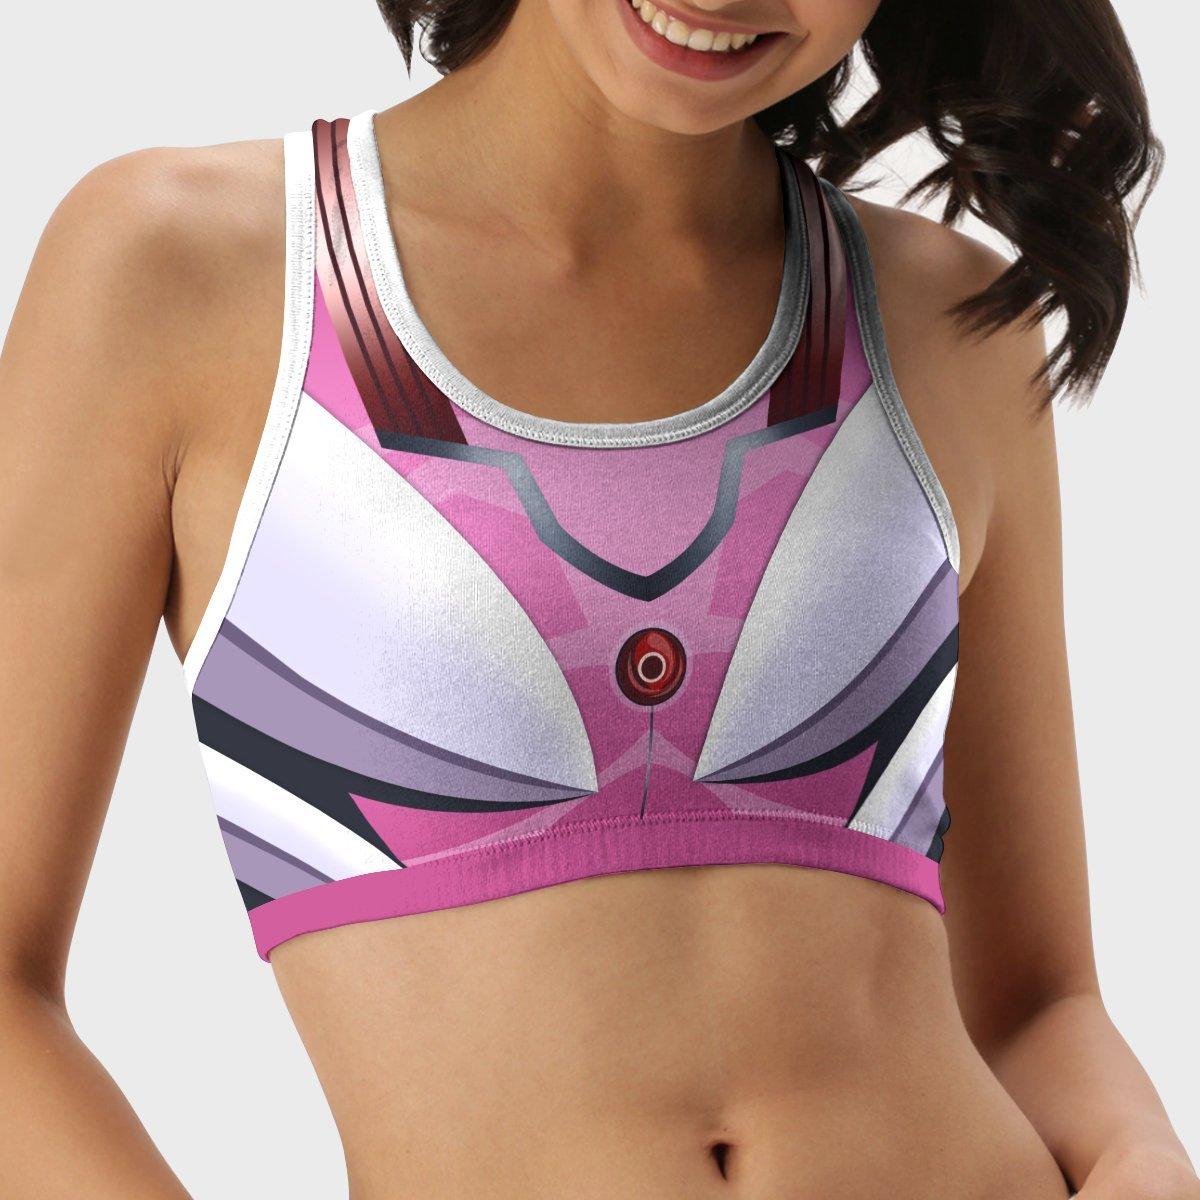 neon genesis mari active wear set 479022 - Anime Swimsuits